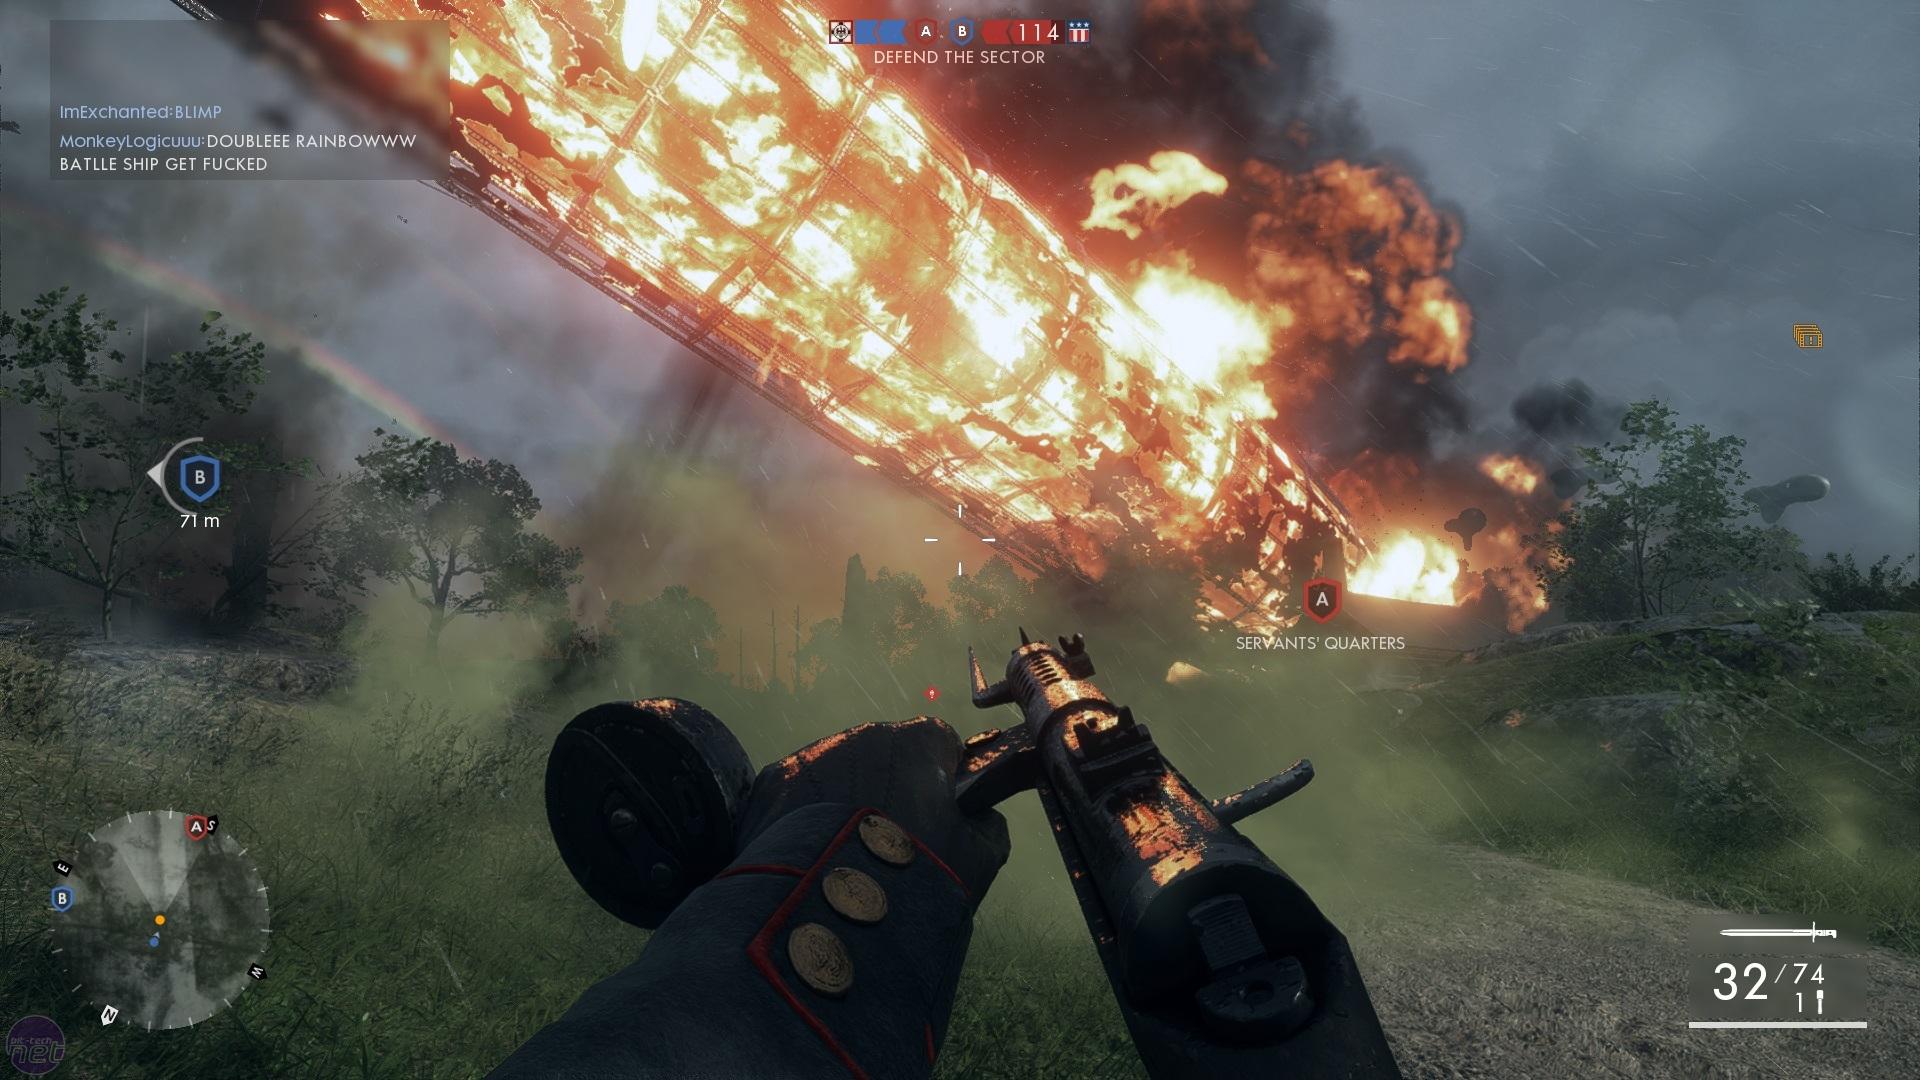 Ea Will Release A New Battlefield Game In 2018 Mspoweruser